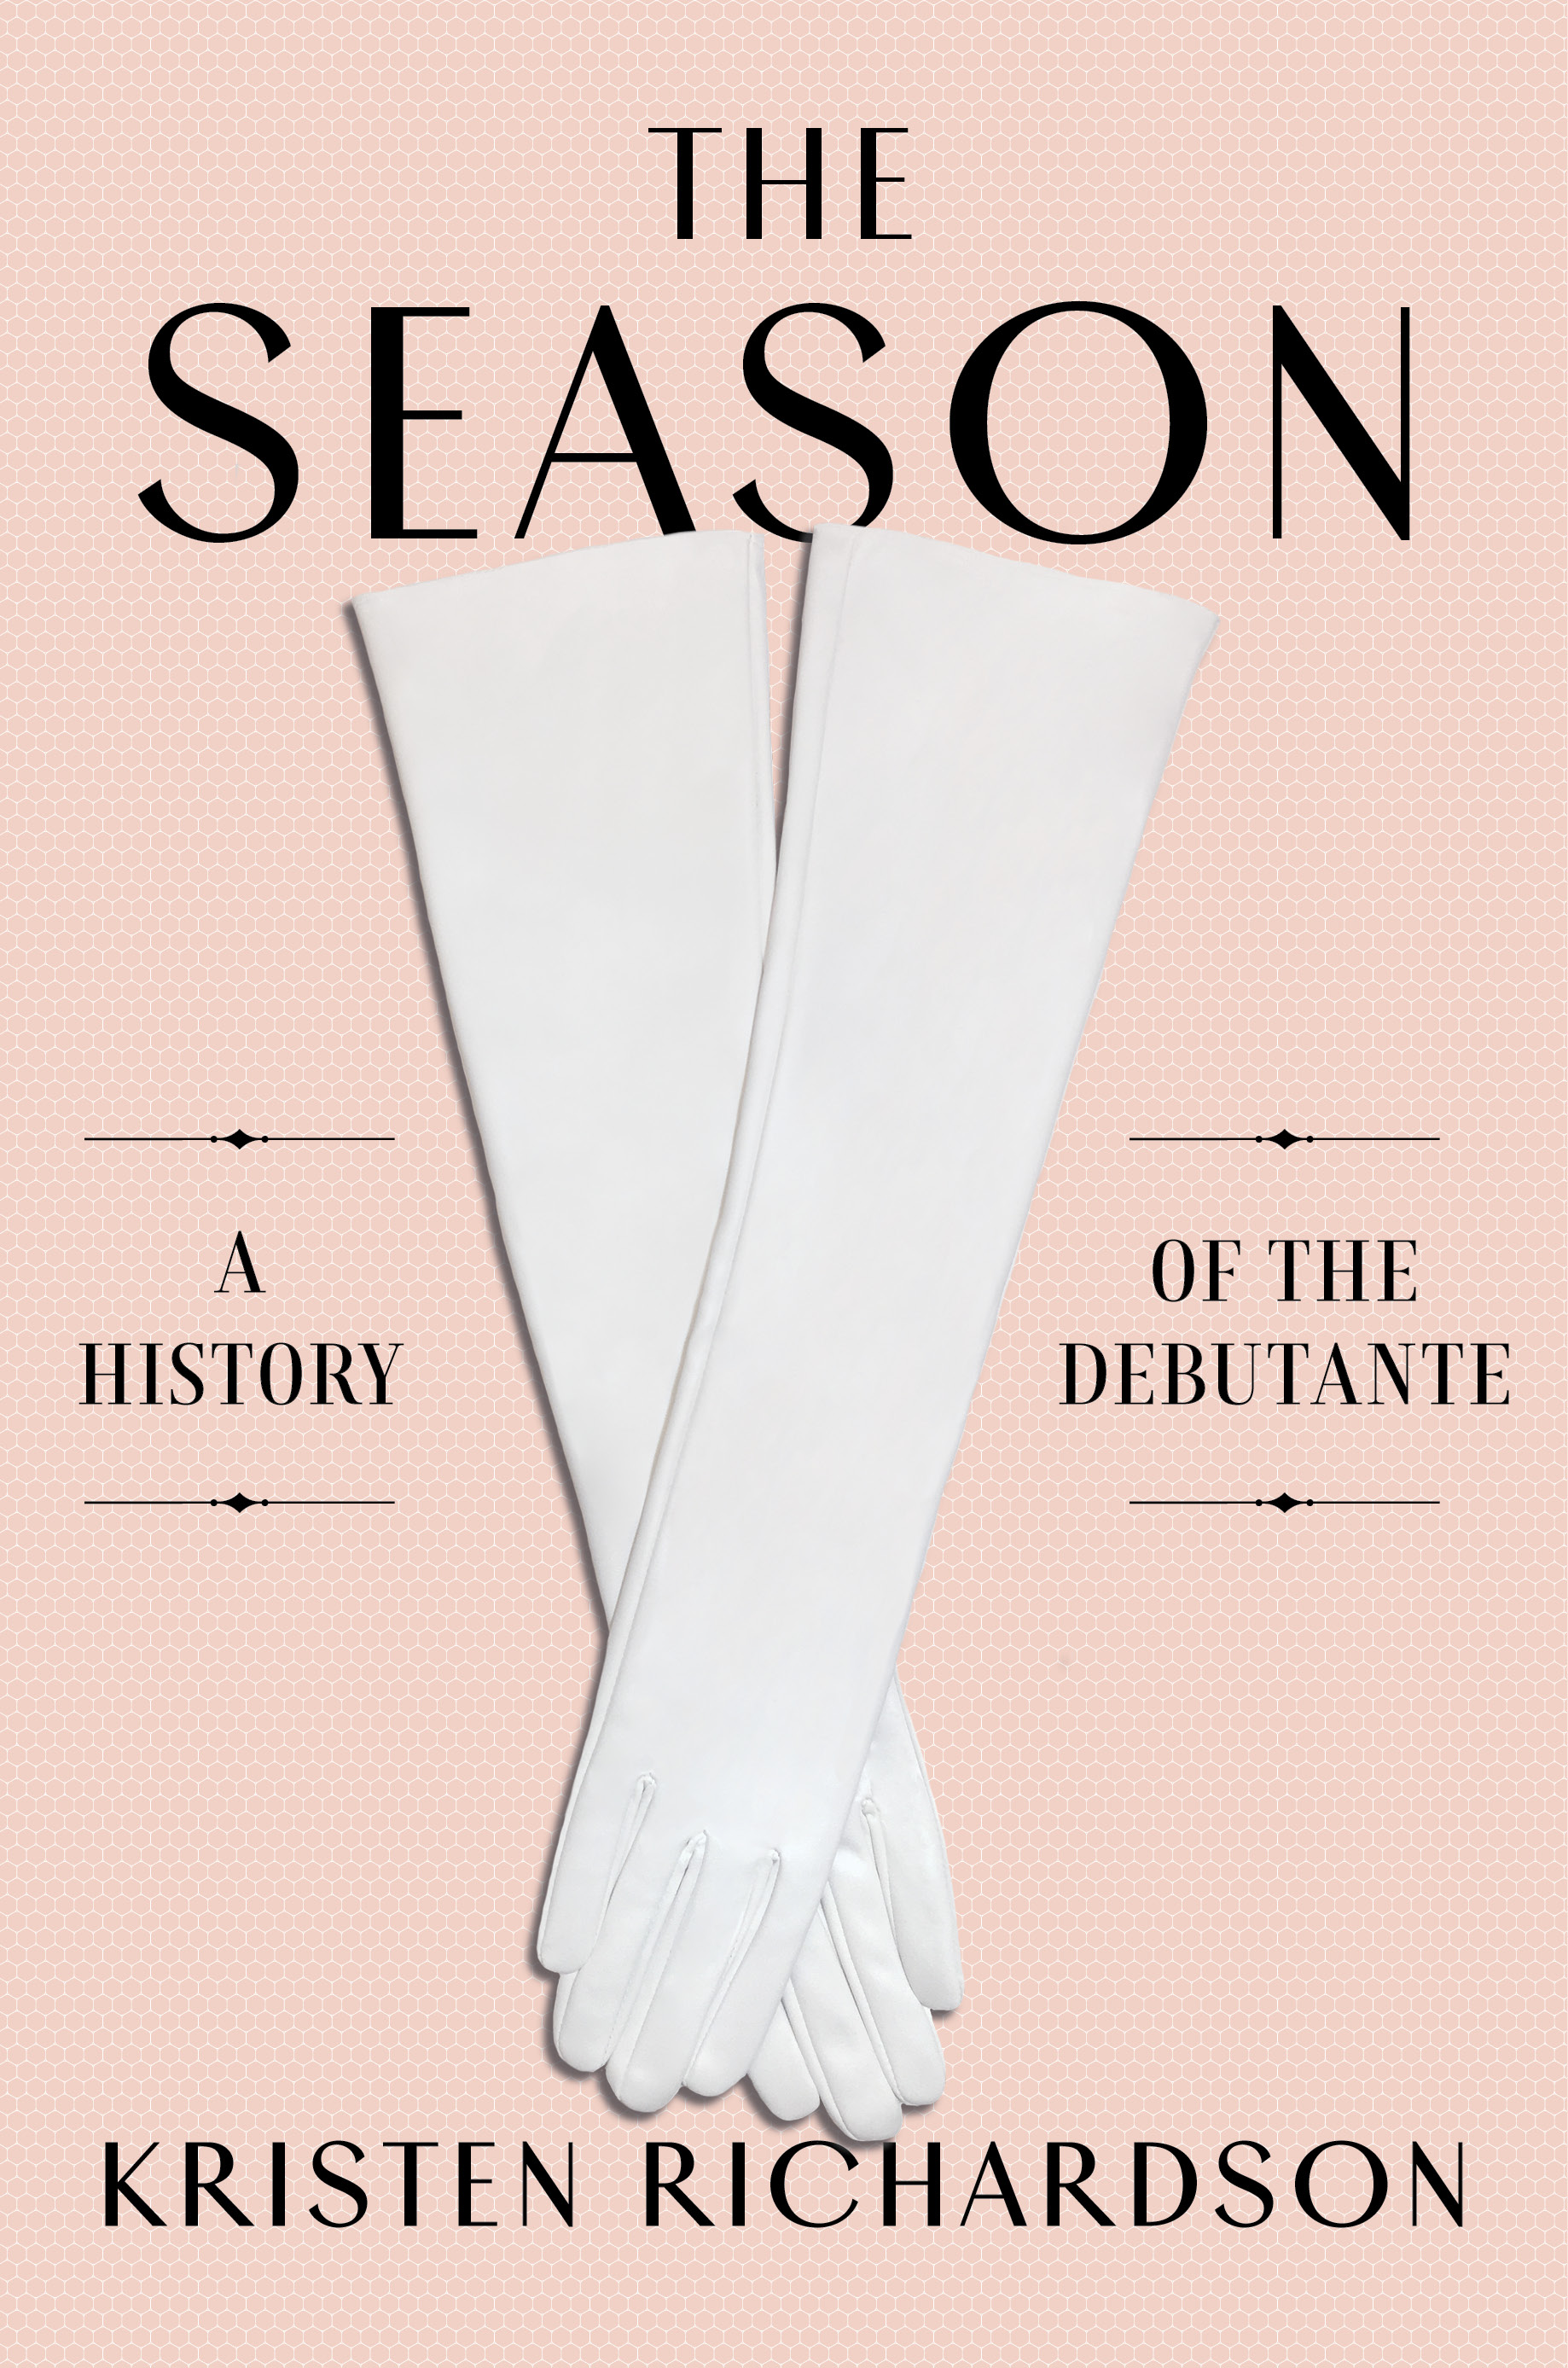 Book Launch: The Season by Kristen Richardson in conversation with Angela Serratore